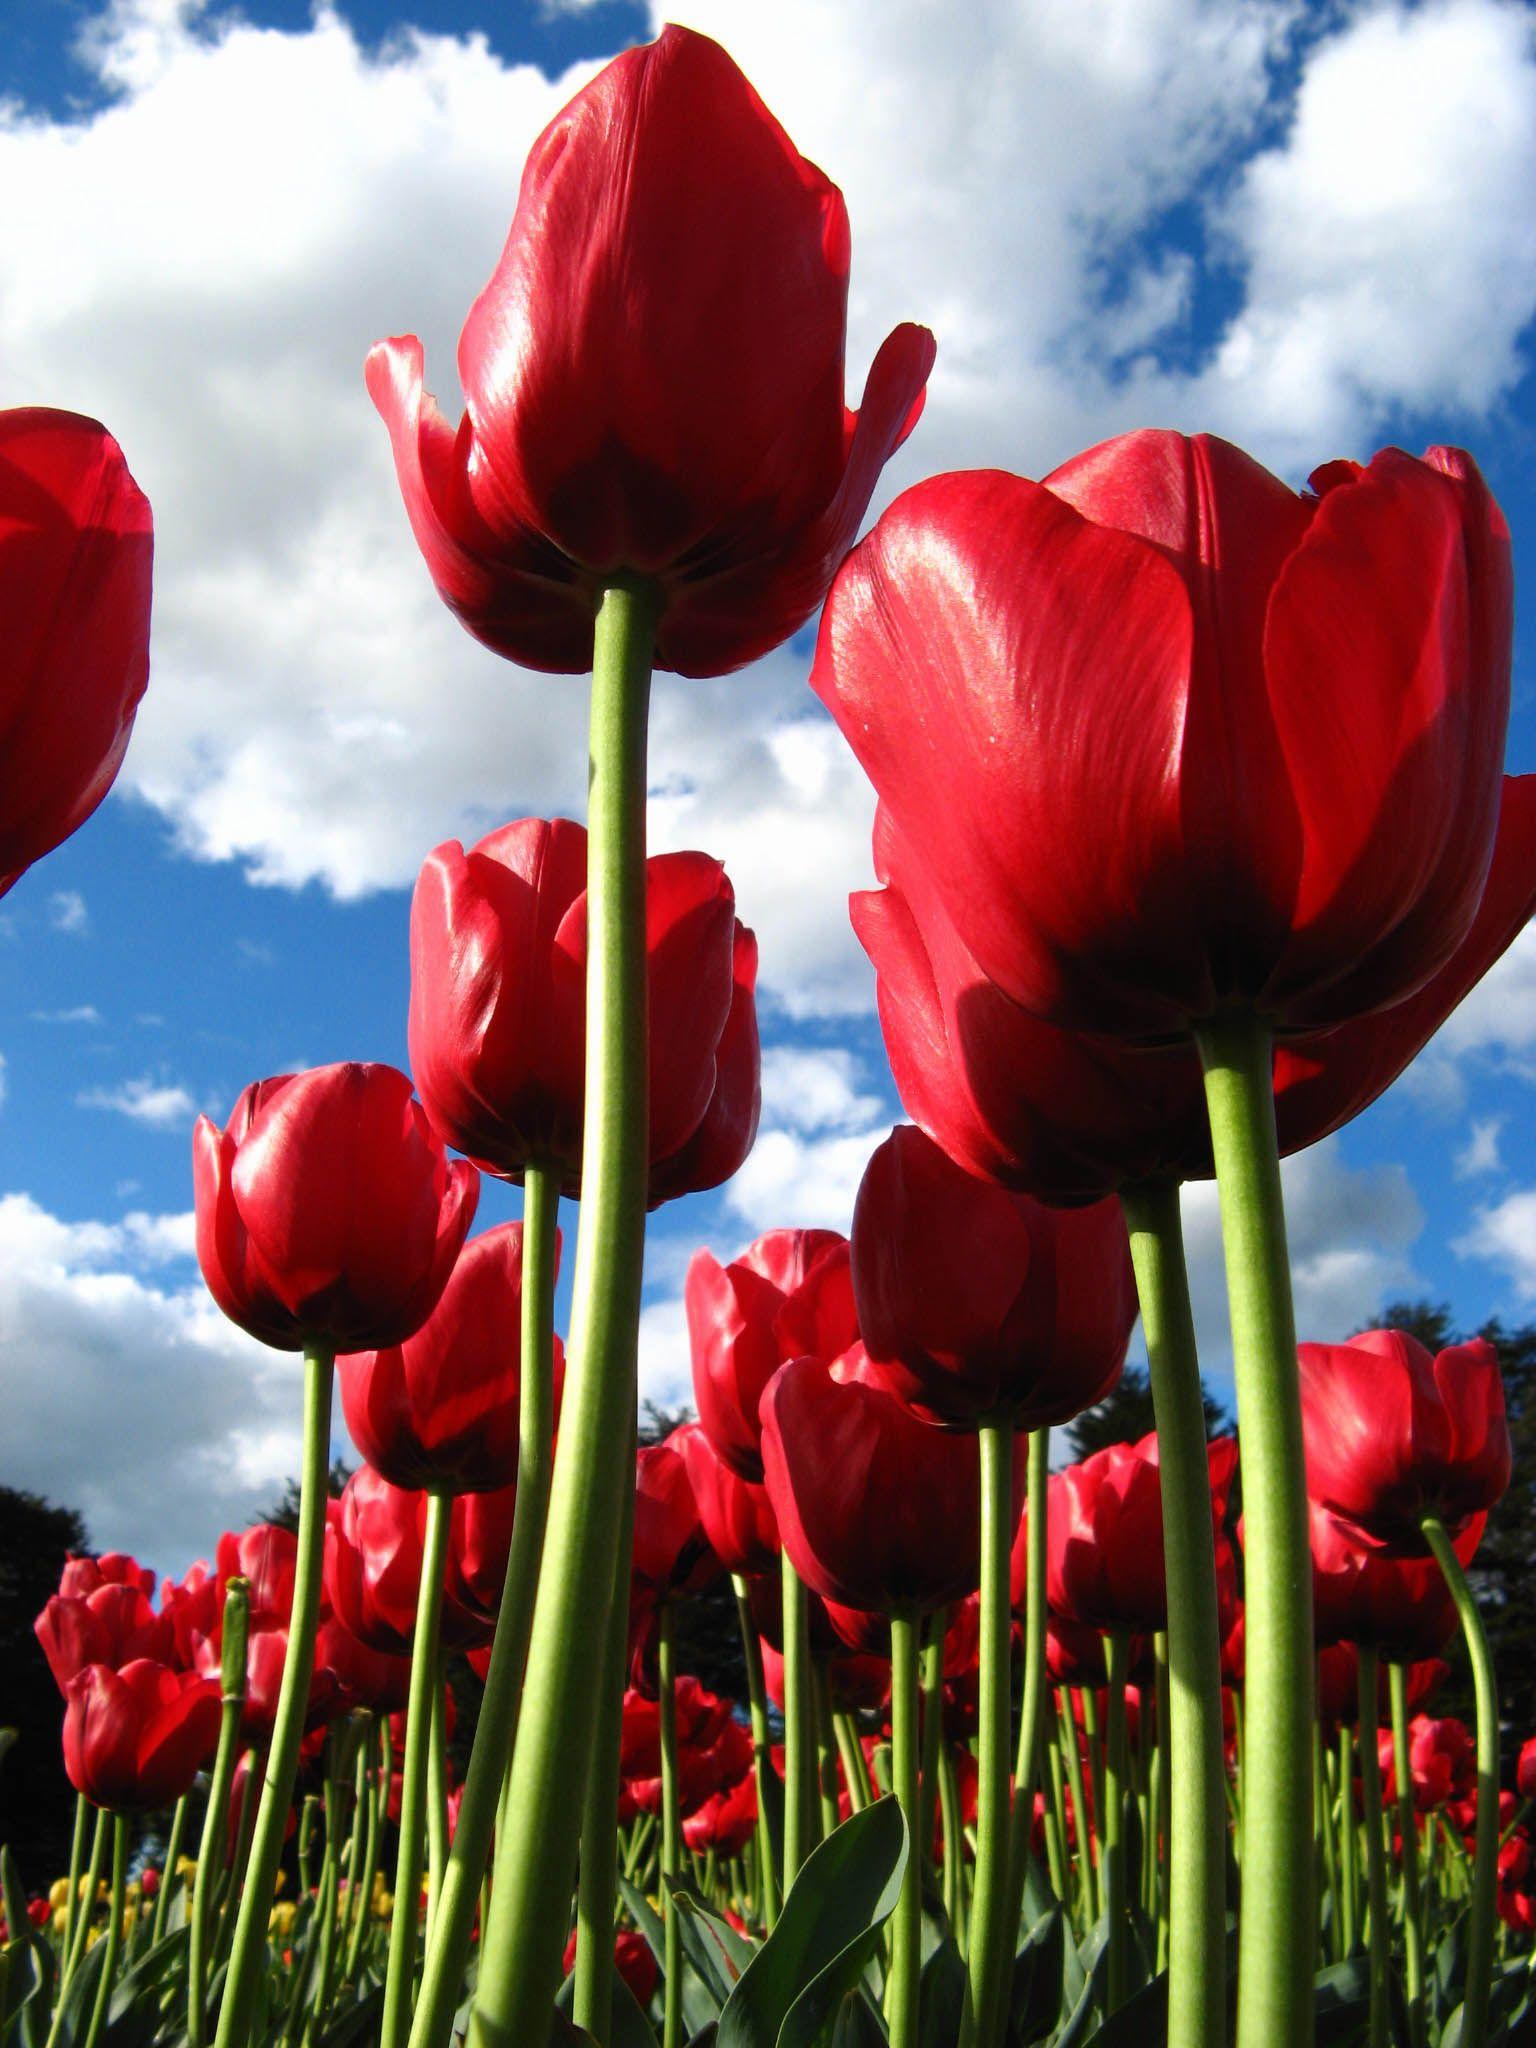 Red tulips, taken at the tulip tesselaar festival in Melbourne.